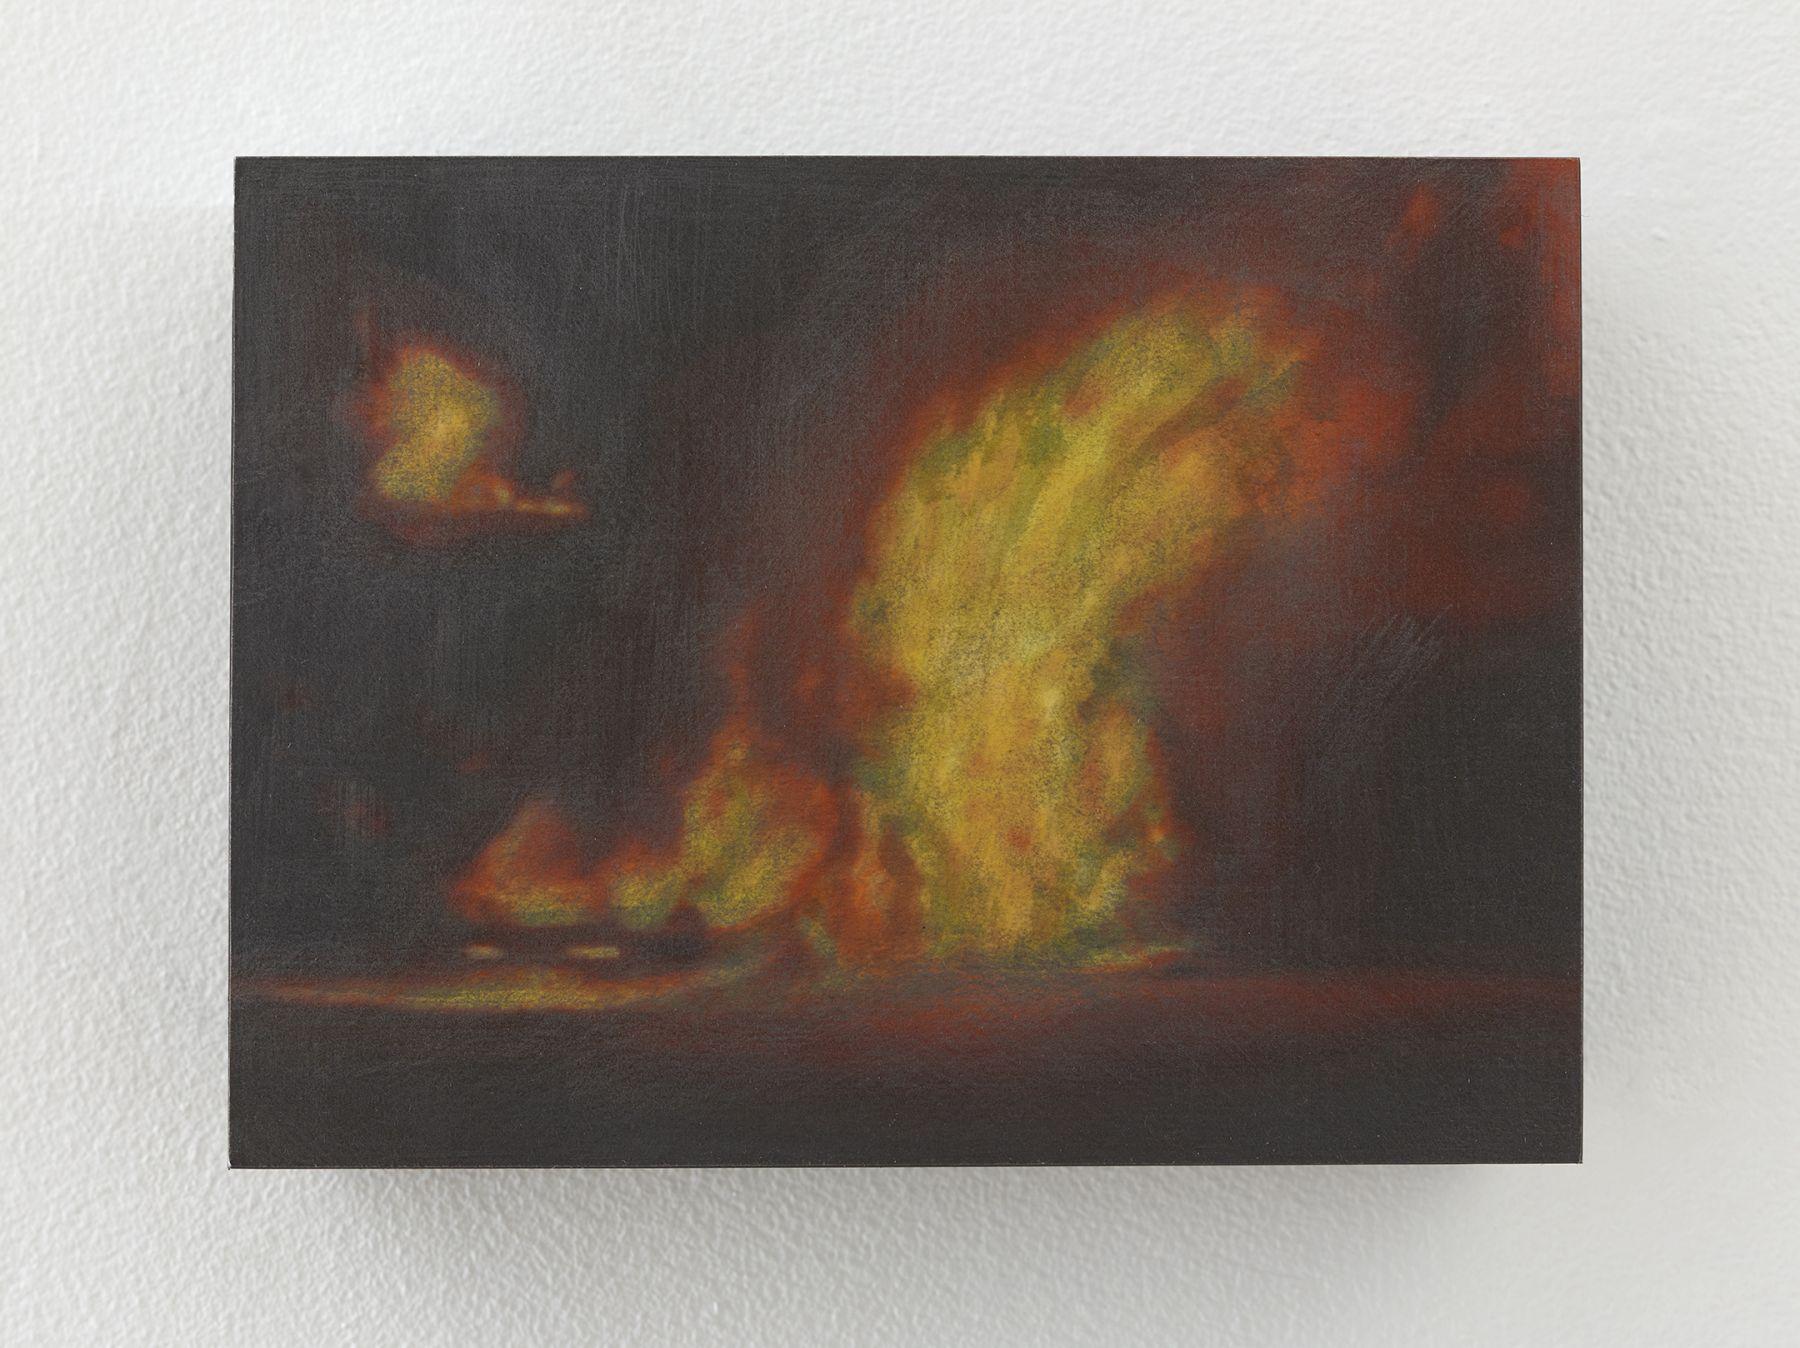 Teresita Fernandez Small American Fires, 2016